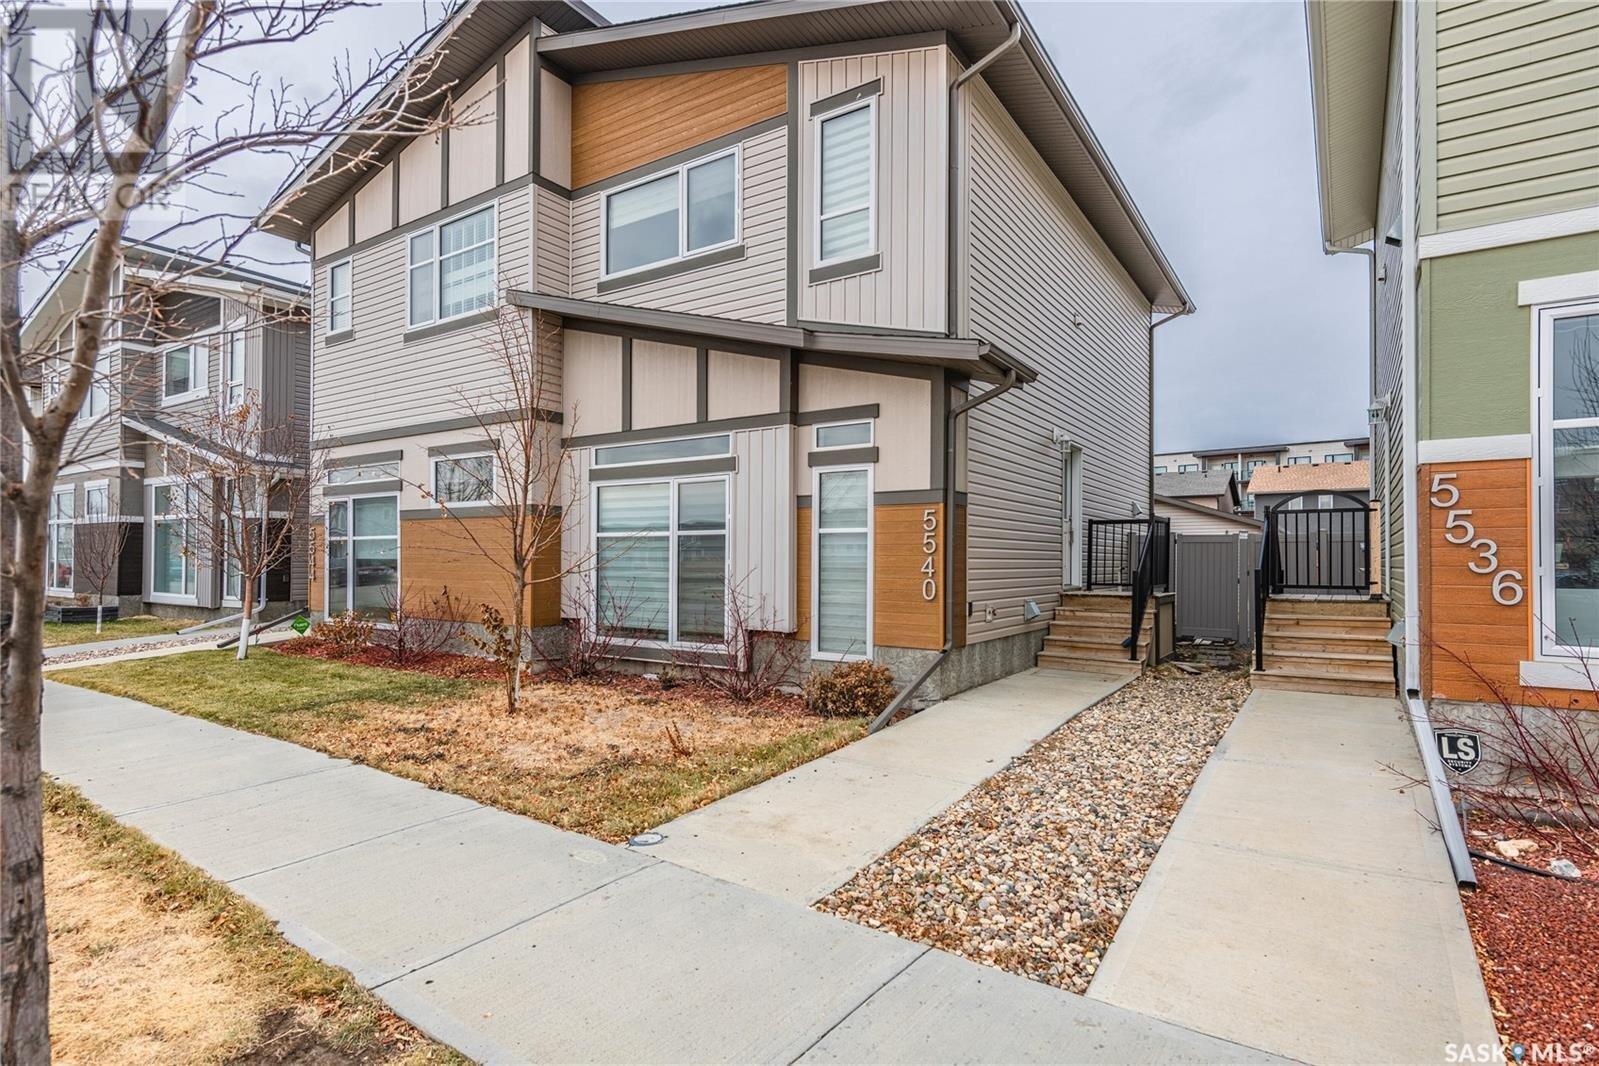 House for sale at 5540 Tutor Wy Regina Saskatchewan - MLS: SK834164